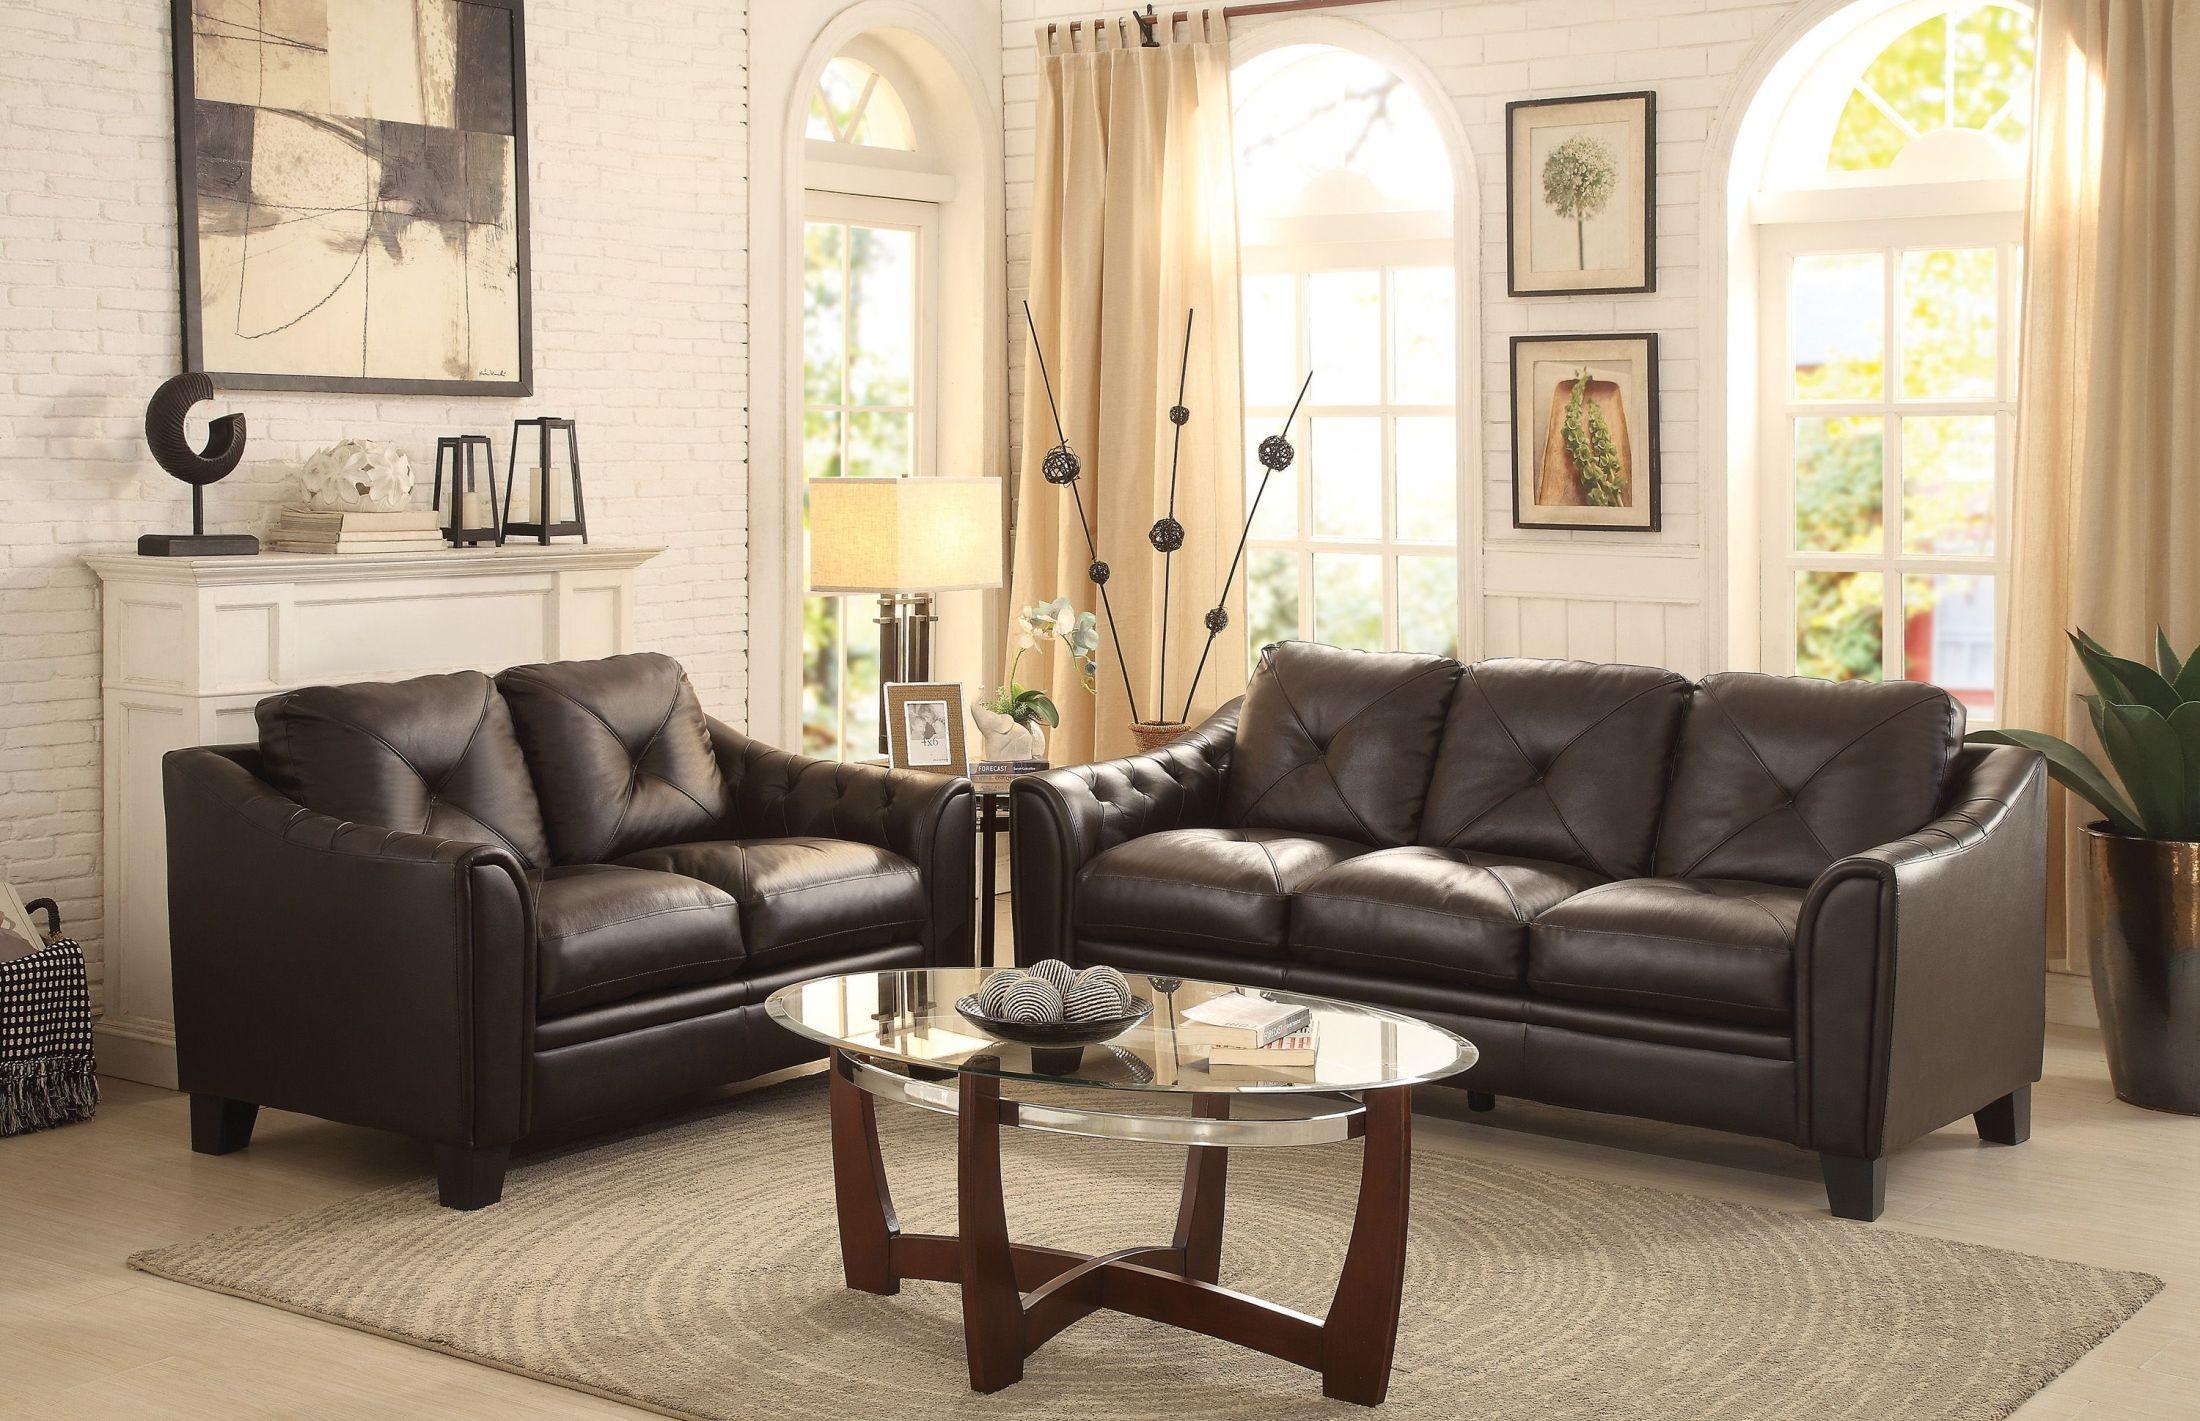 Memphis brown sofa 8311 3 homelegance for Cheap living room furniture memphis tn